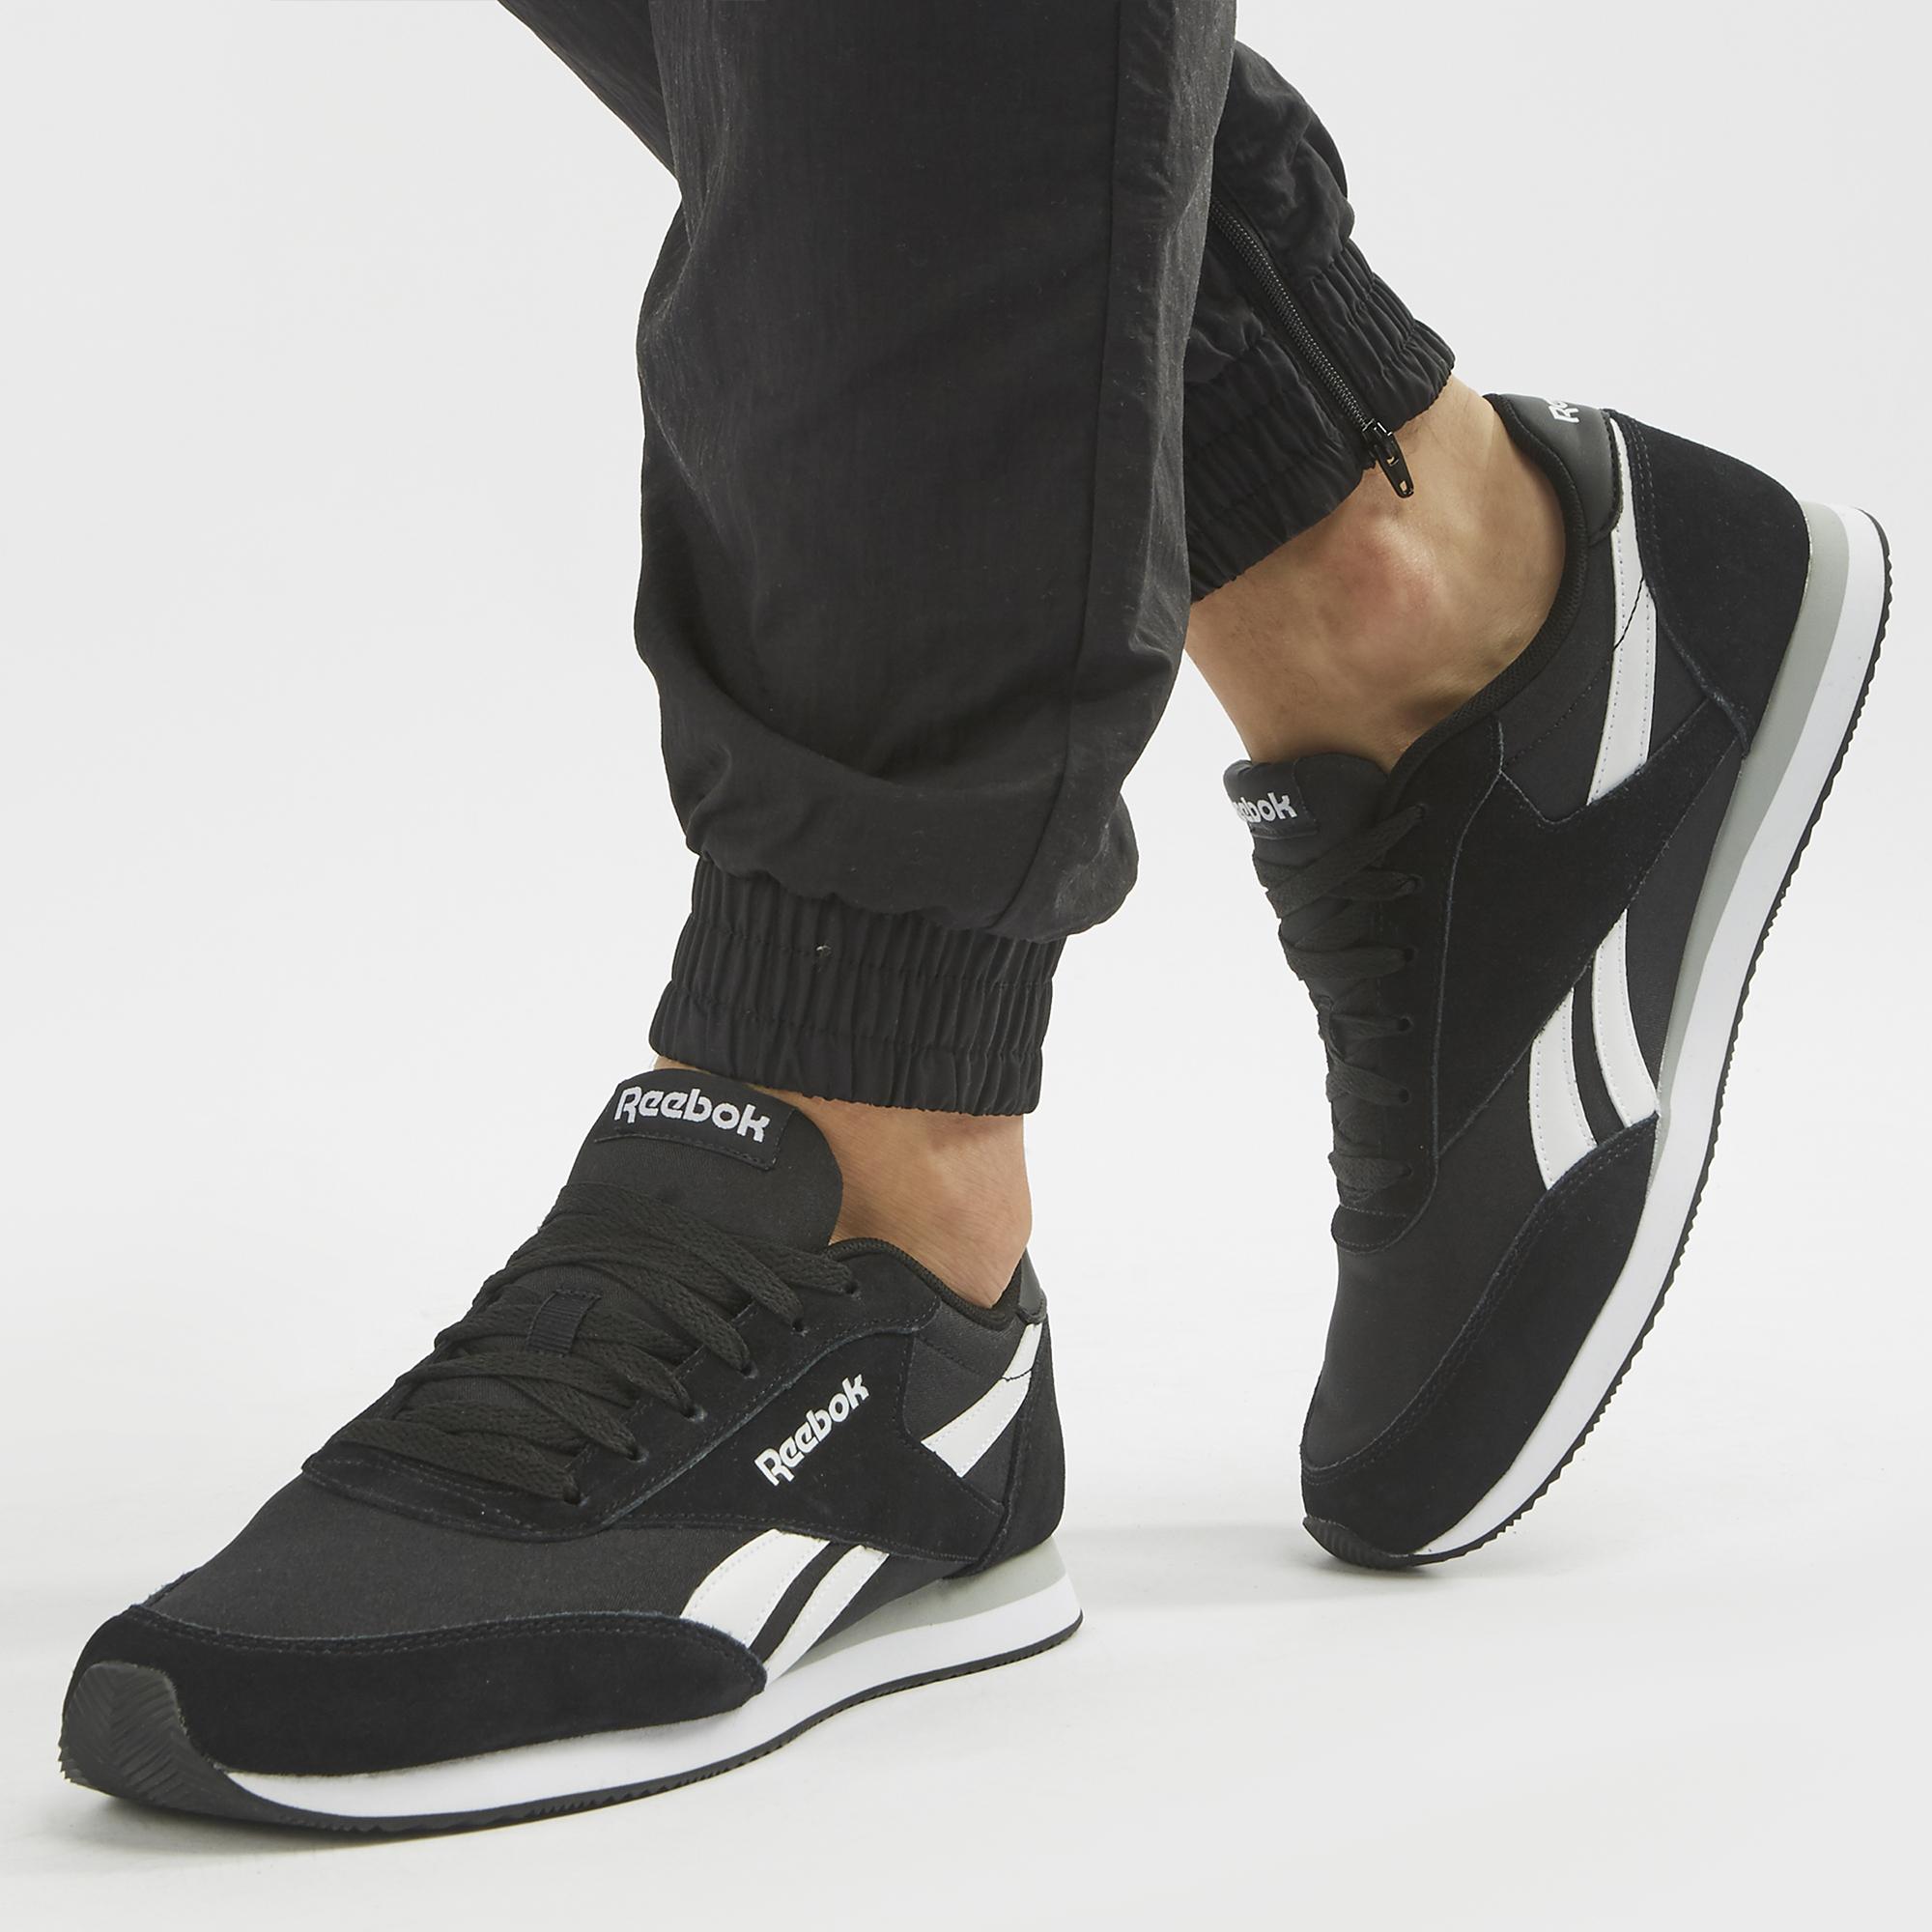 ce525919a42bc Reebok Royal Classic Jogger 2 Shoe